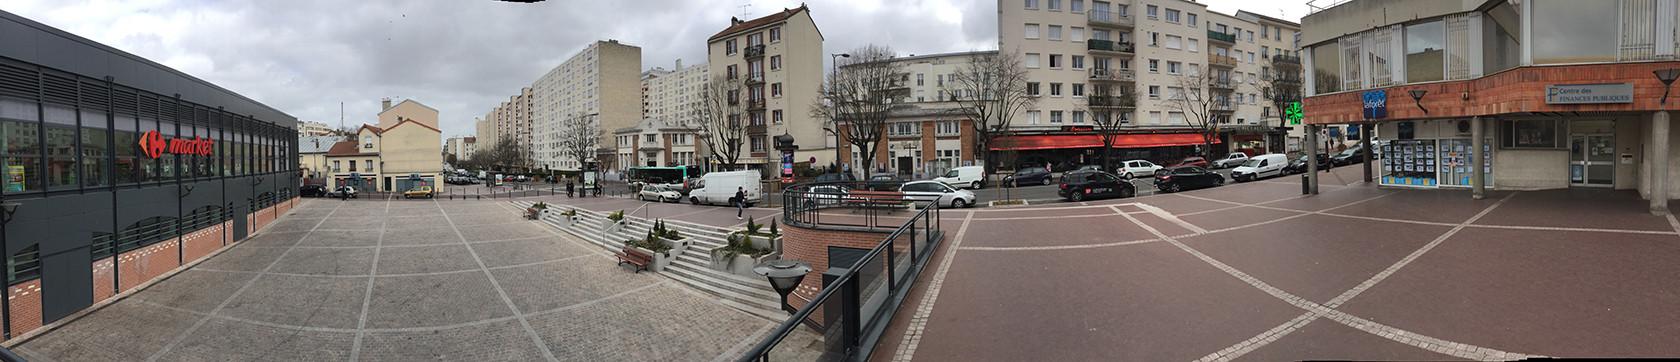 PA350_-_Chatillon_place_du_marché_05.JPG